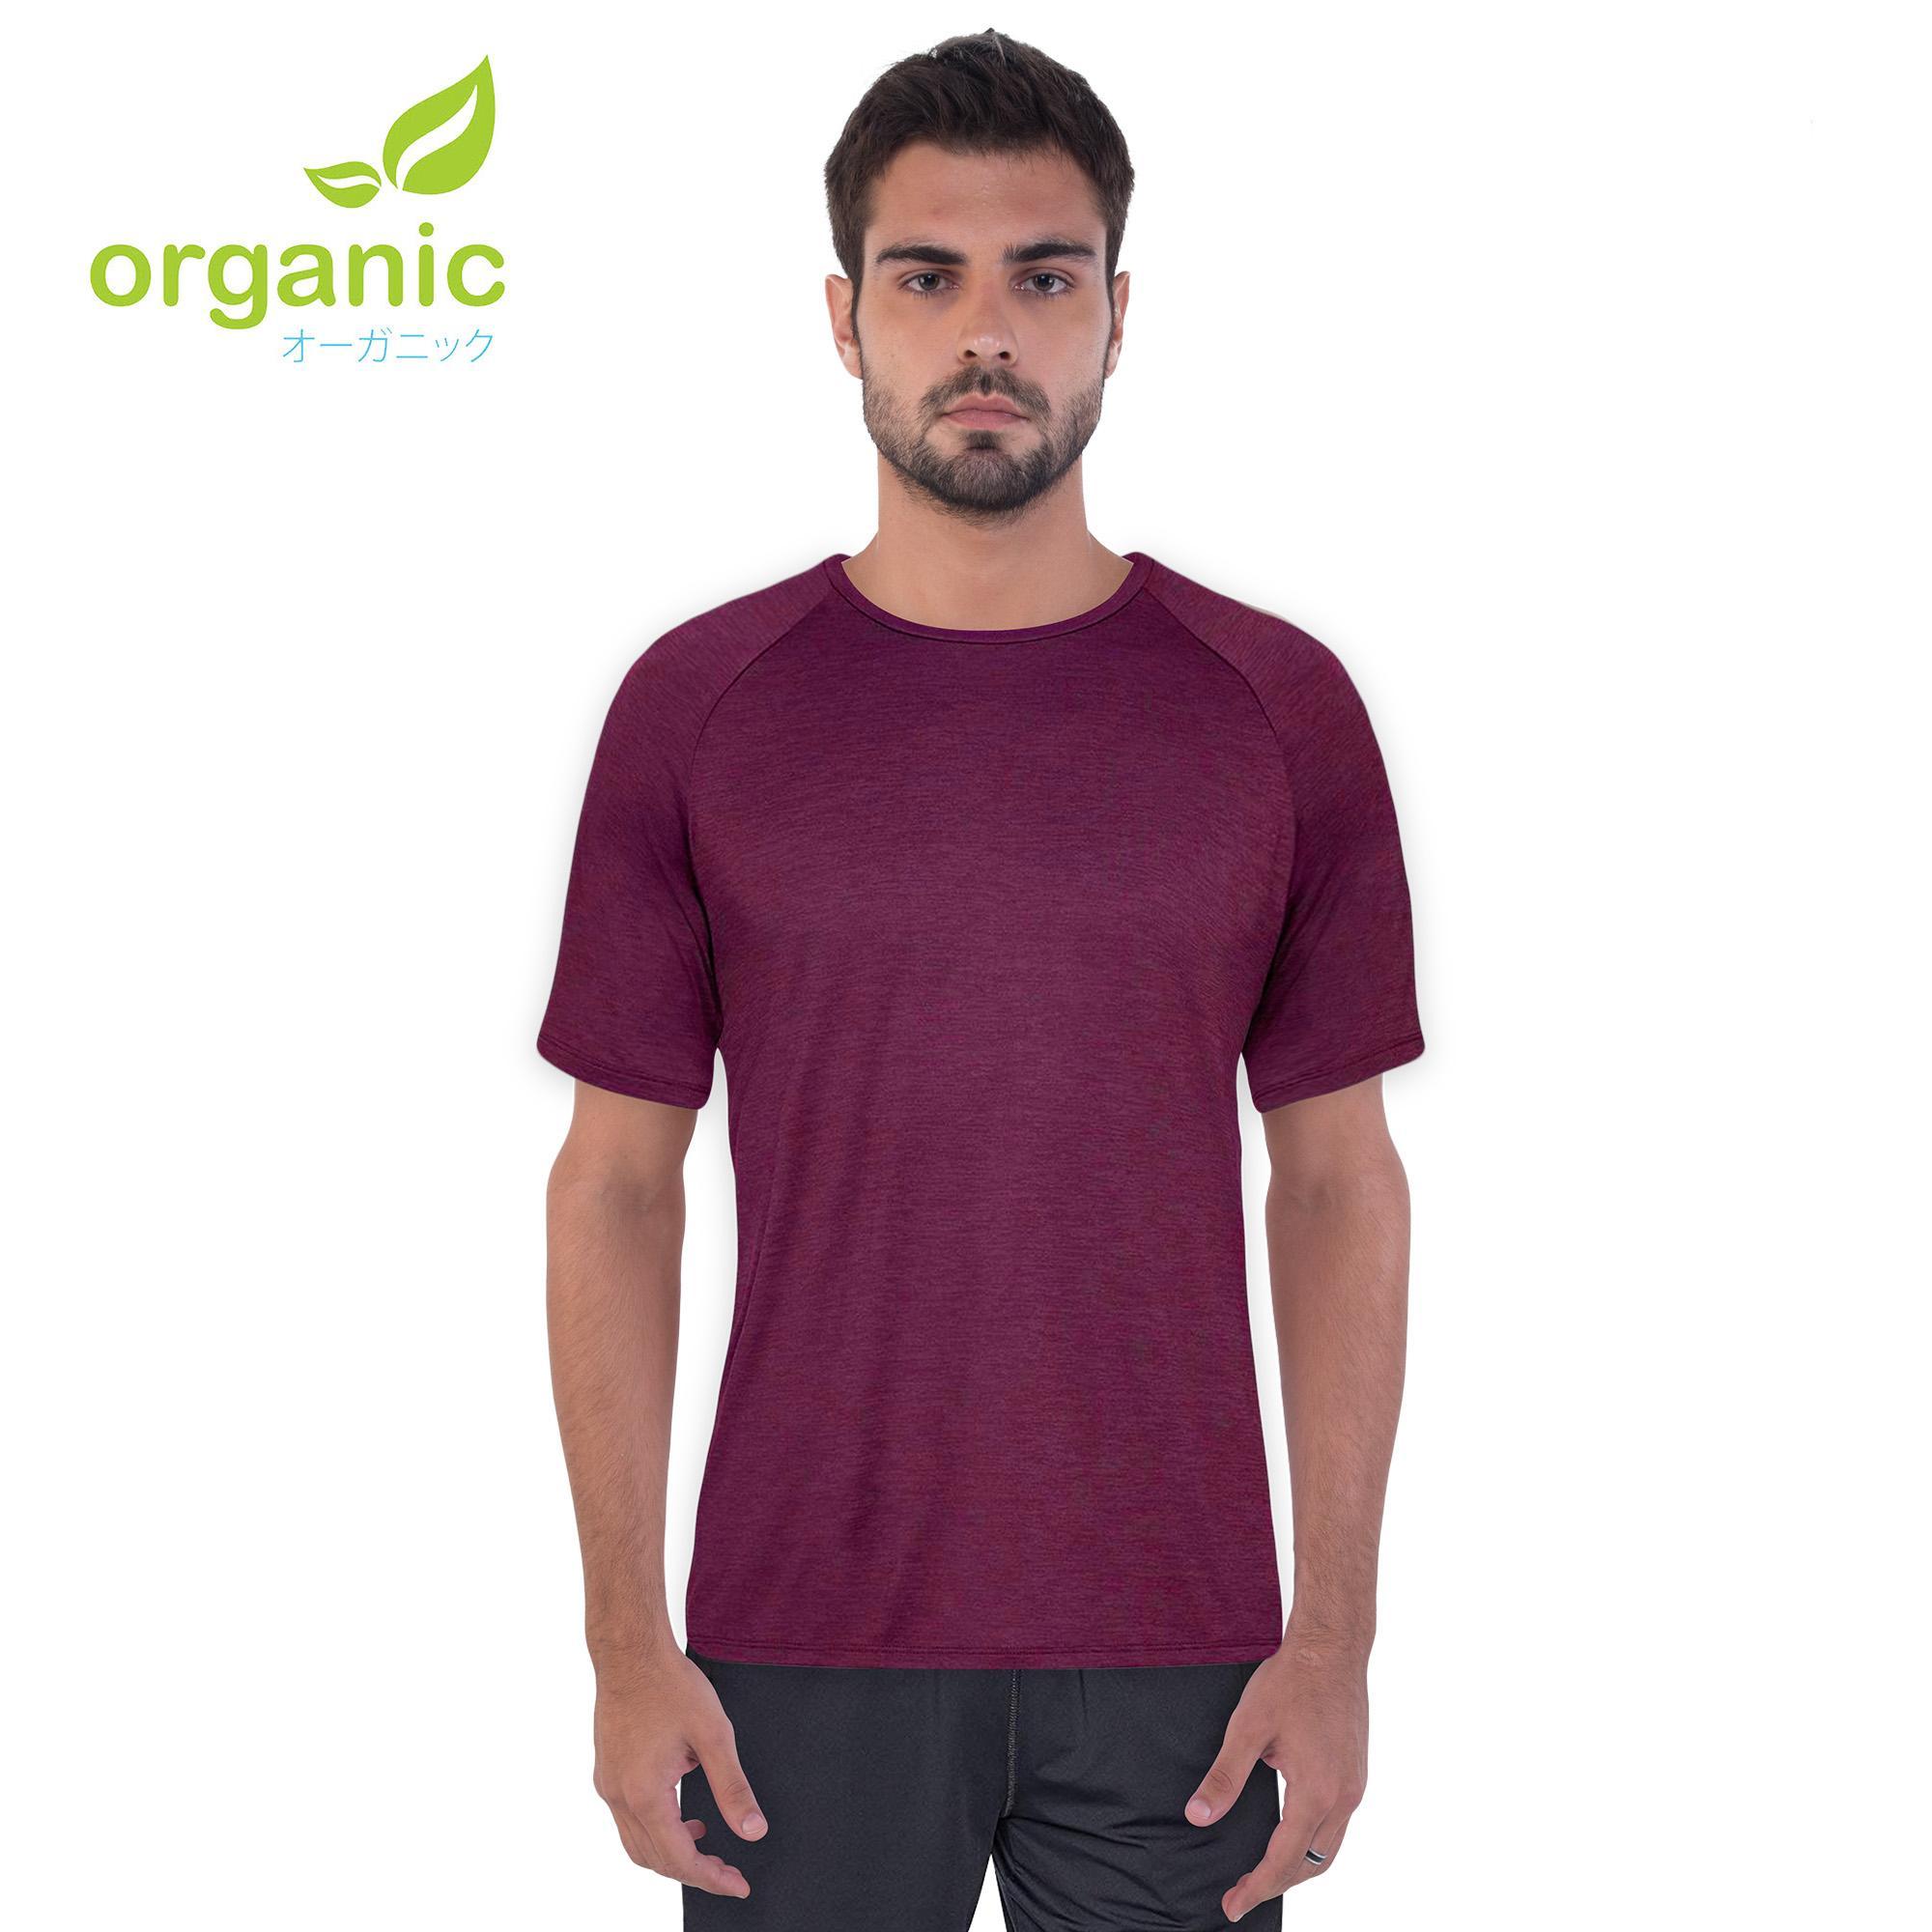 5dd59bc6137 Organic Men Cool Gear Active Sports Wear Shirt Gym Training Dry Dri Fit  Fitness Gym Shirt